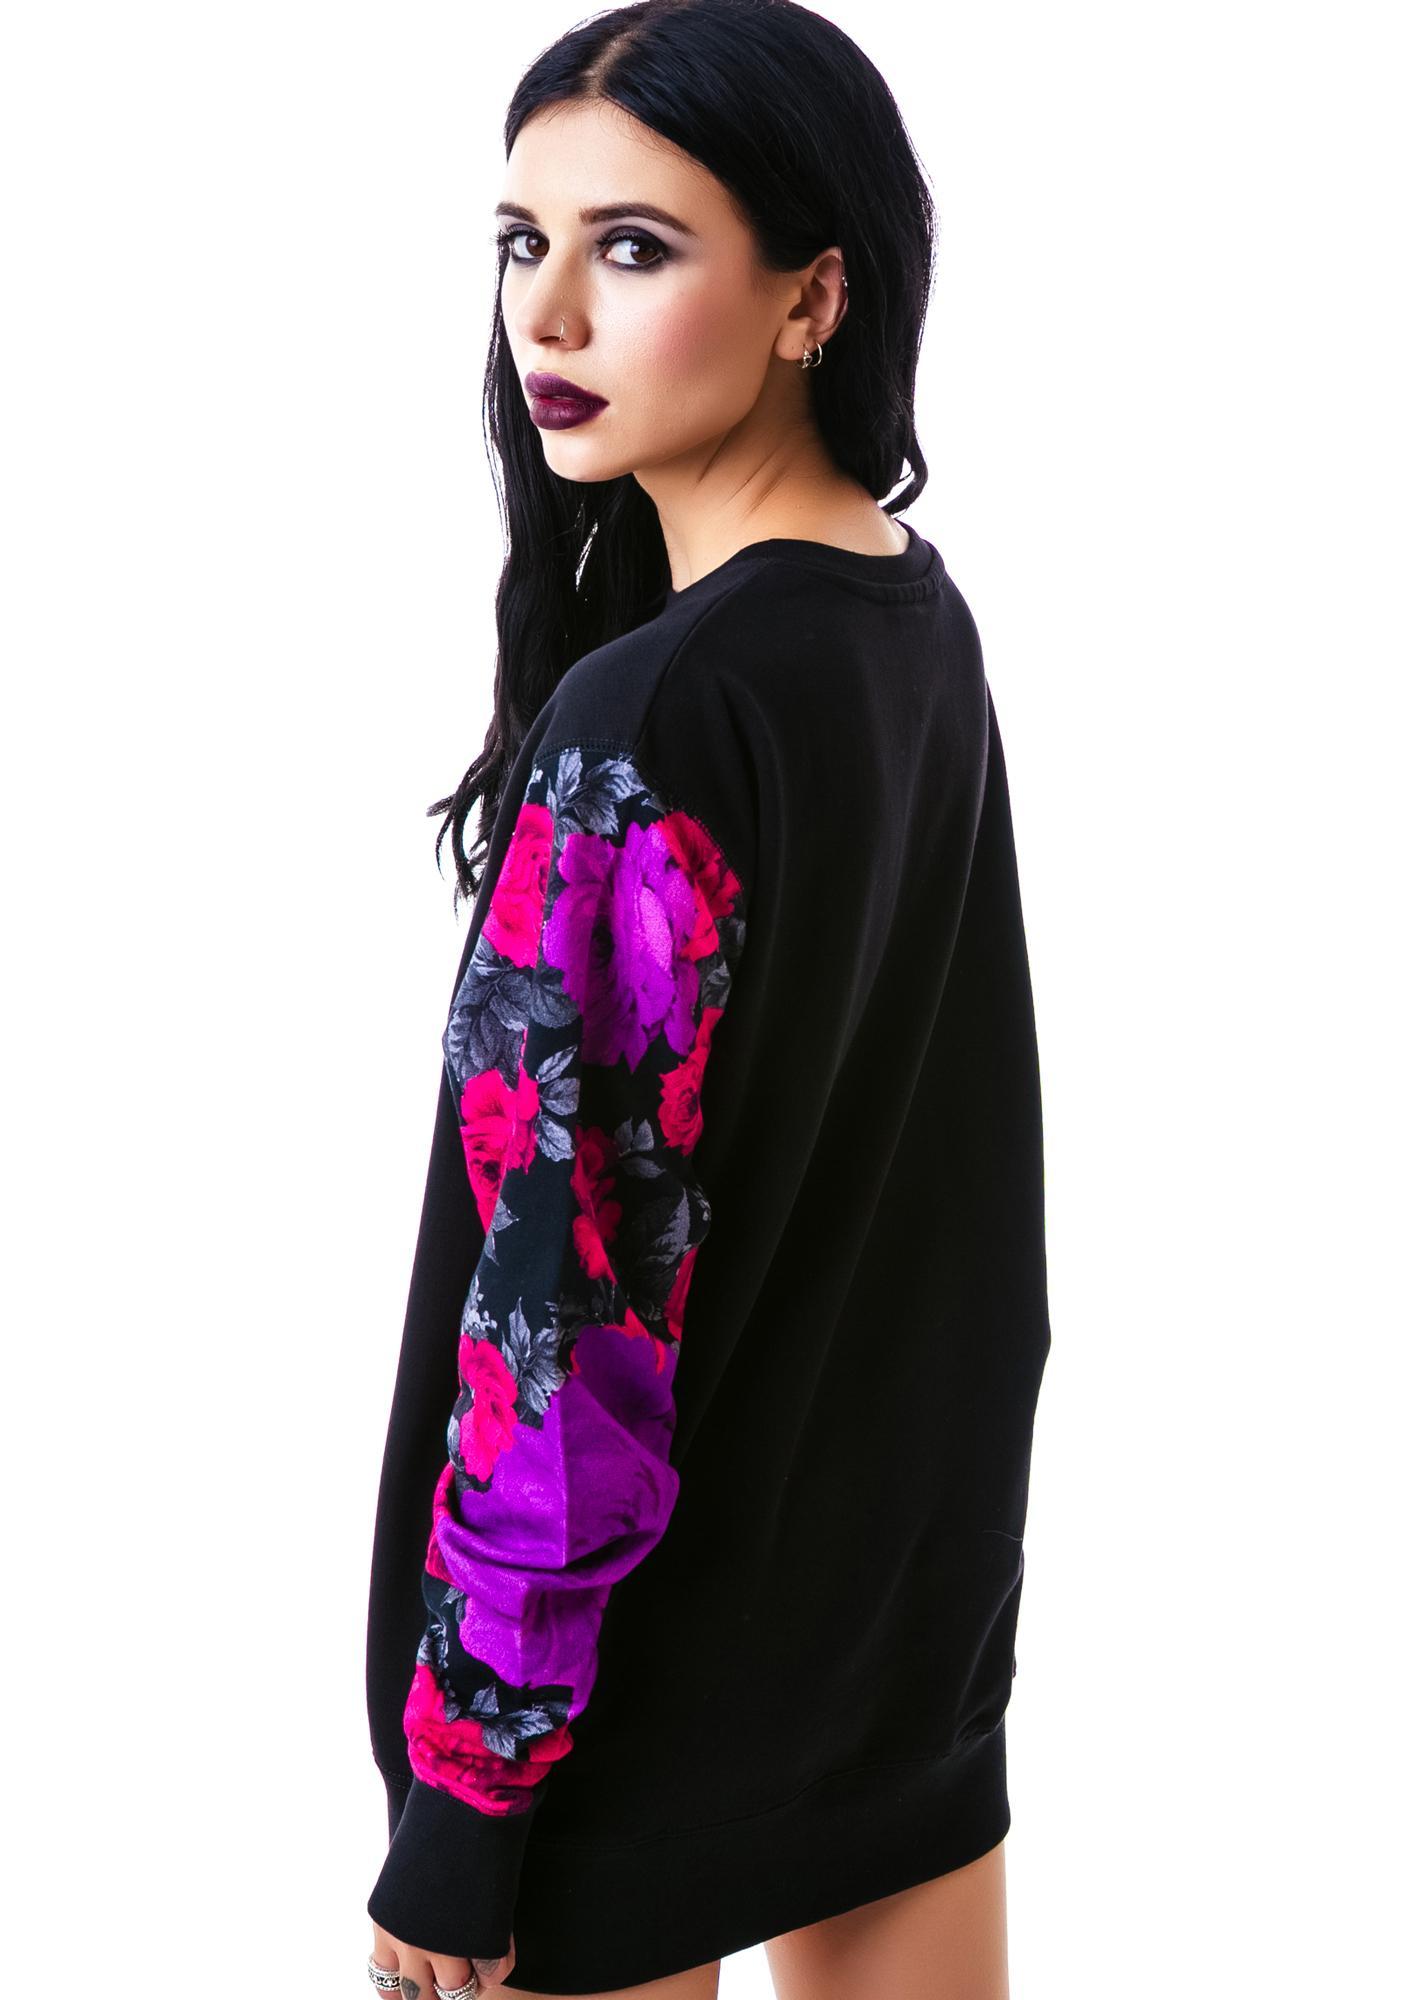 Killstar Death 50/50 Sweatshirt